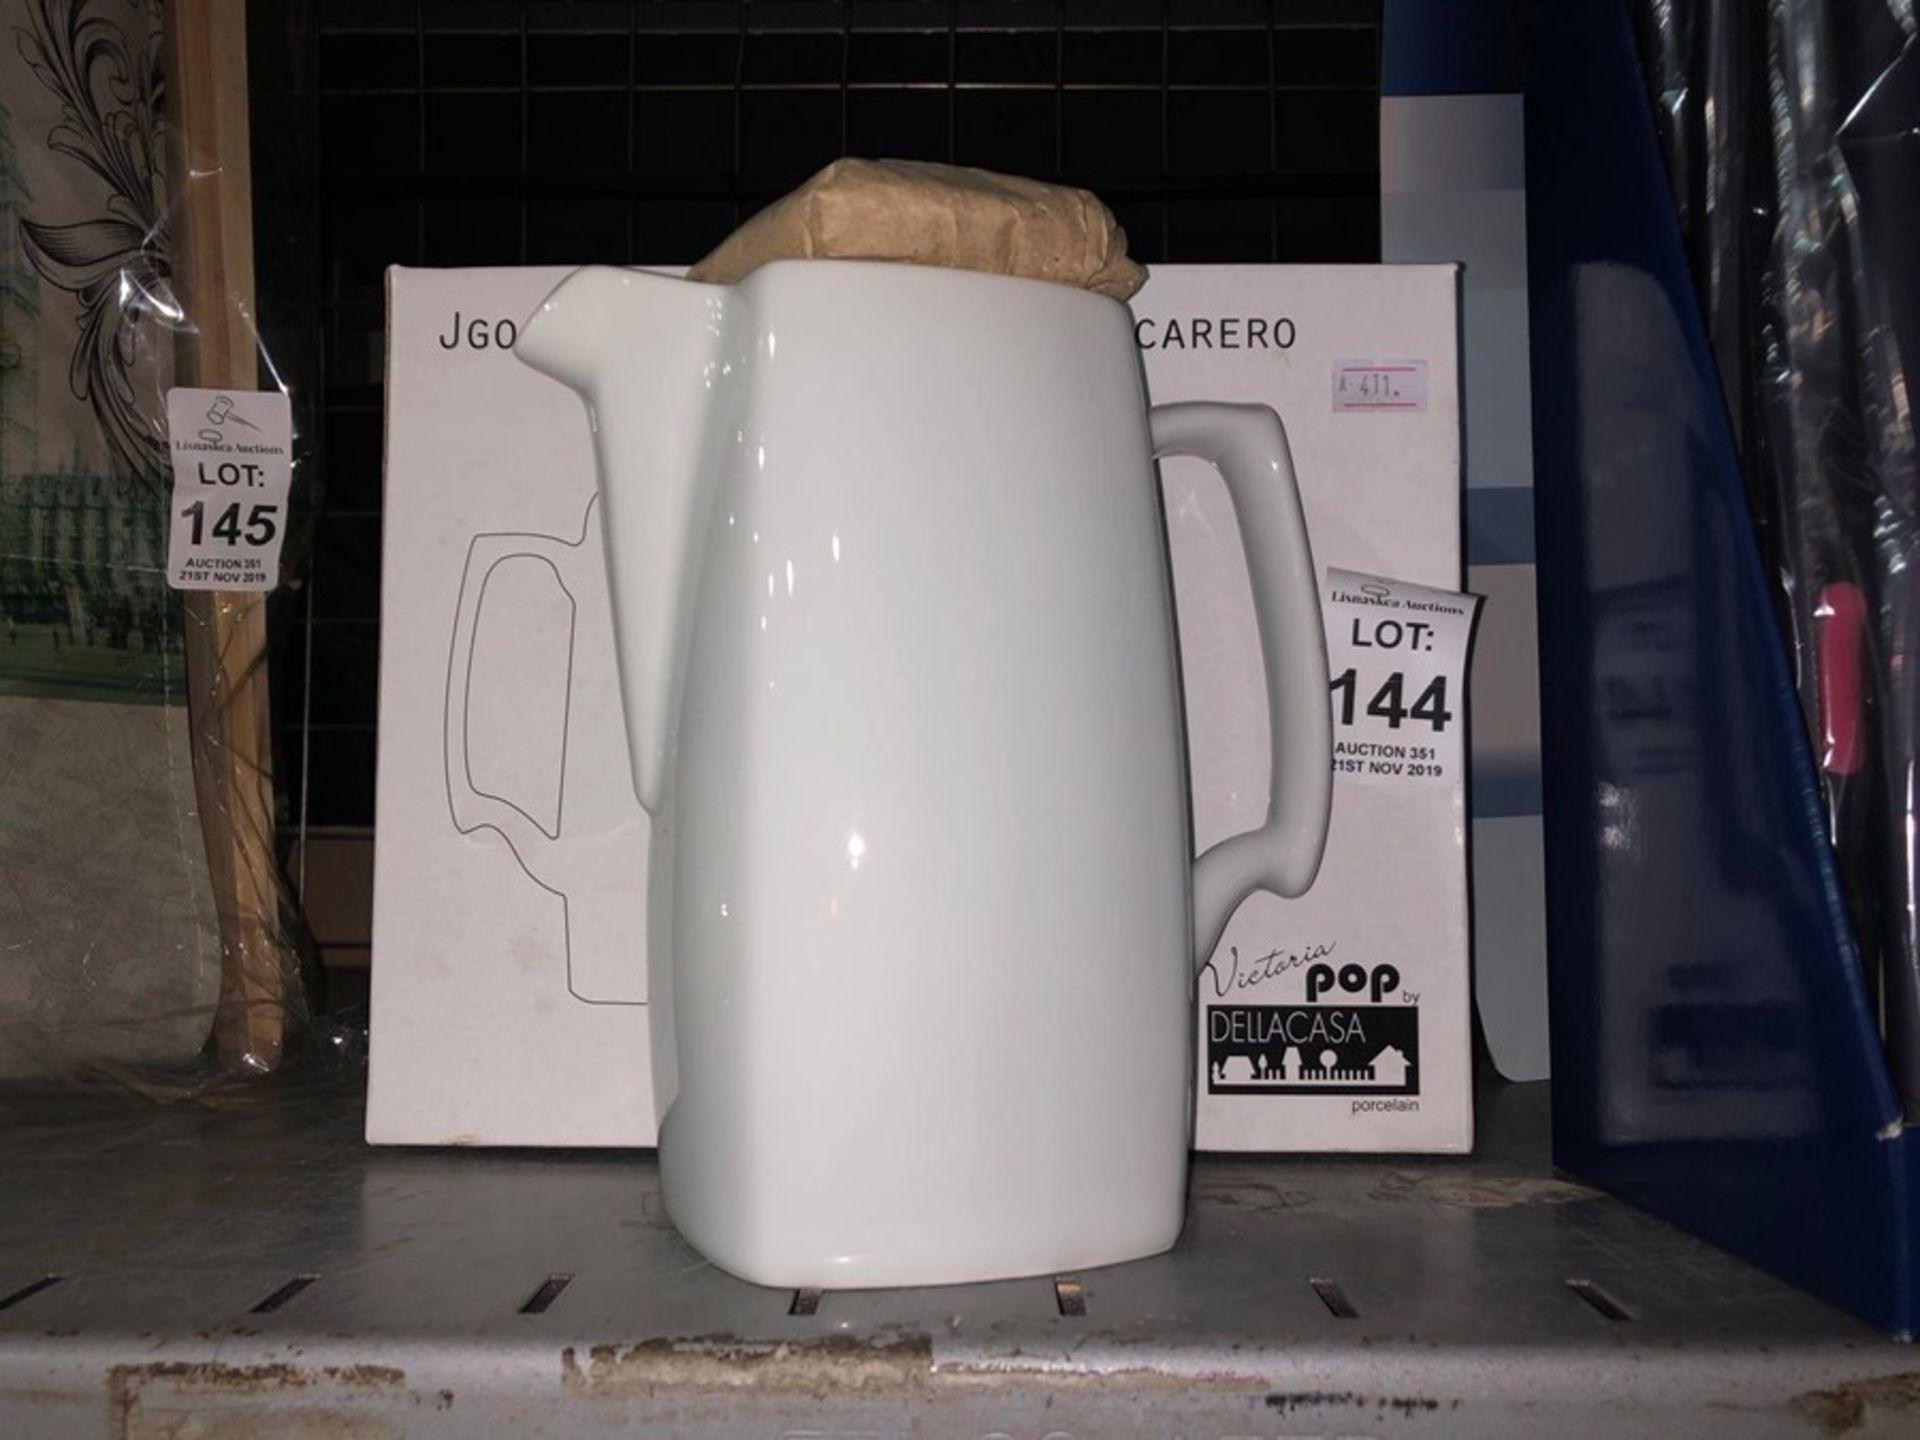 Lot 144 - NEW BOXED COFFEE POT JUG AND SUGAR BOWL SHOP CLEARANCE